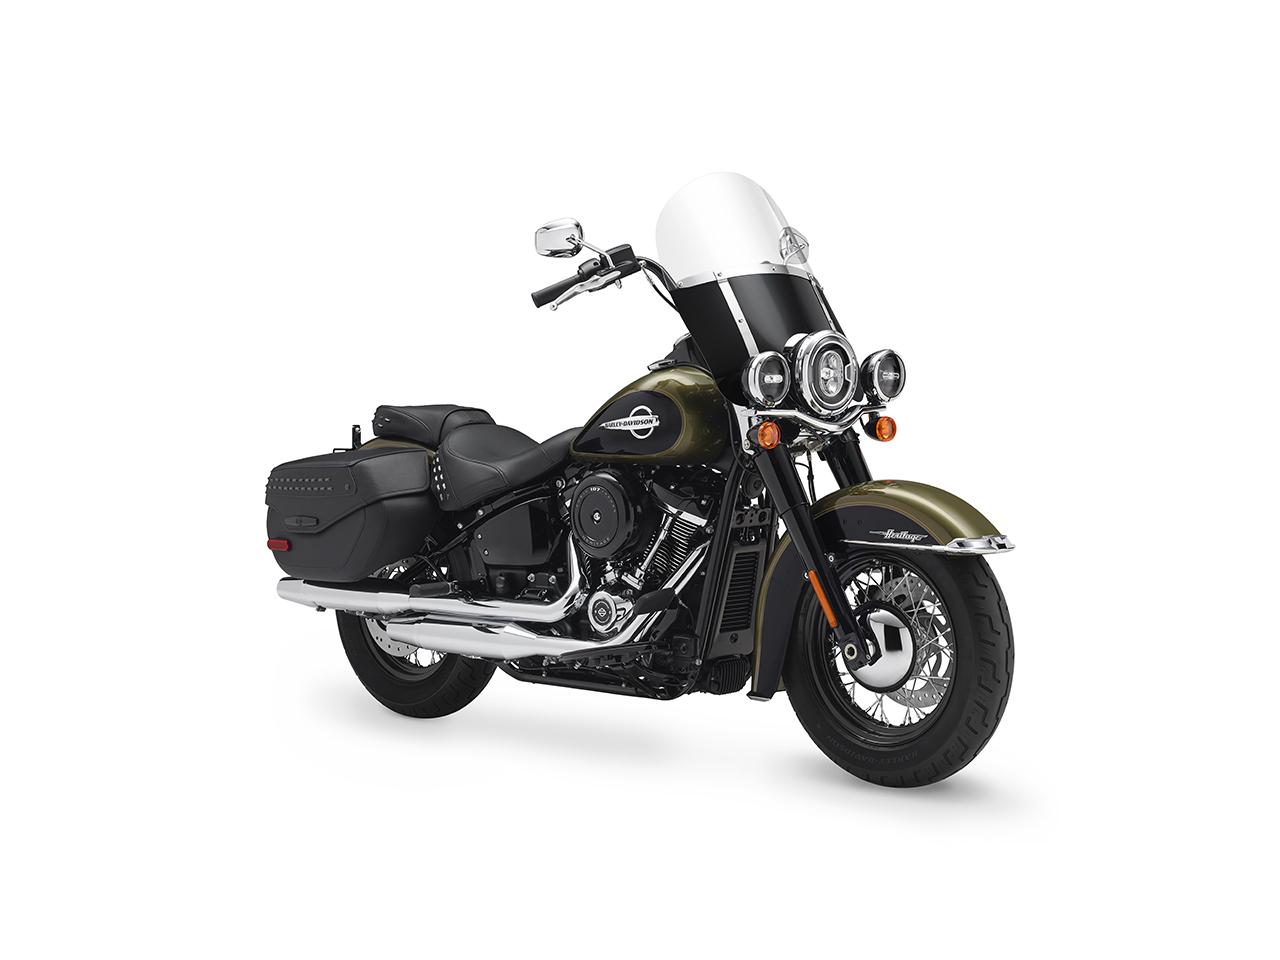 2018 Harley-Davidson Heritage Classic Image